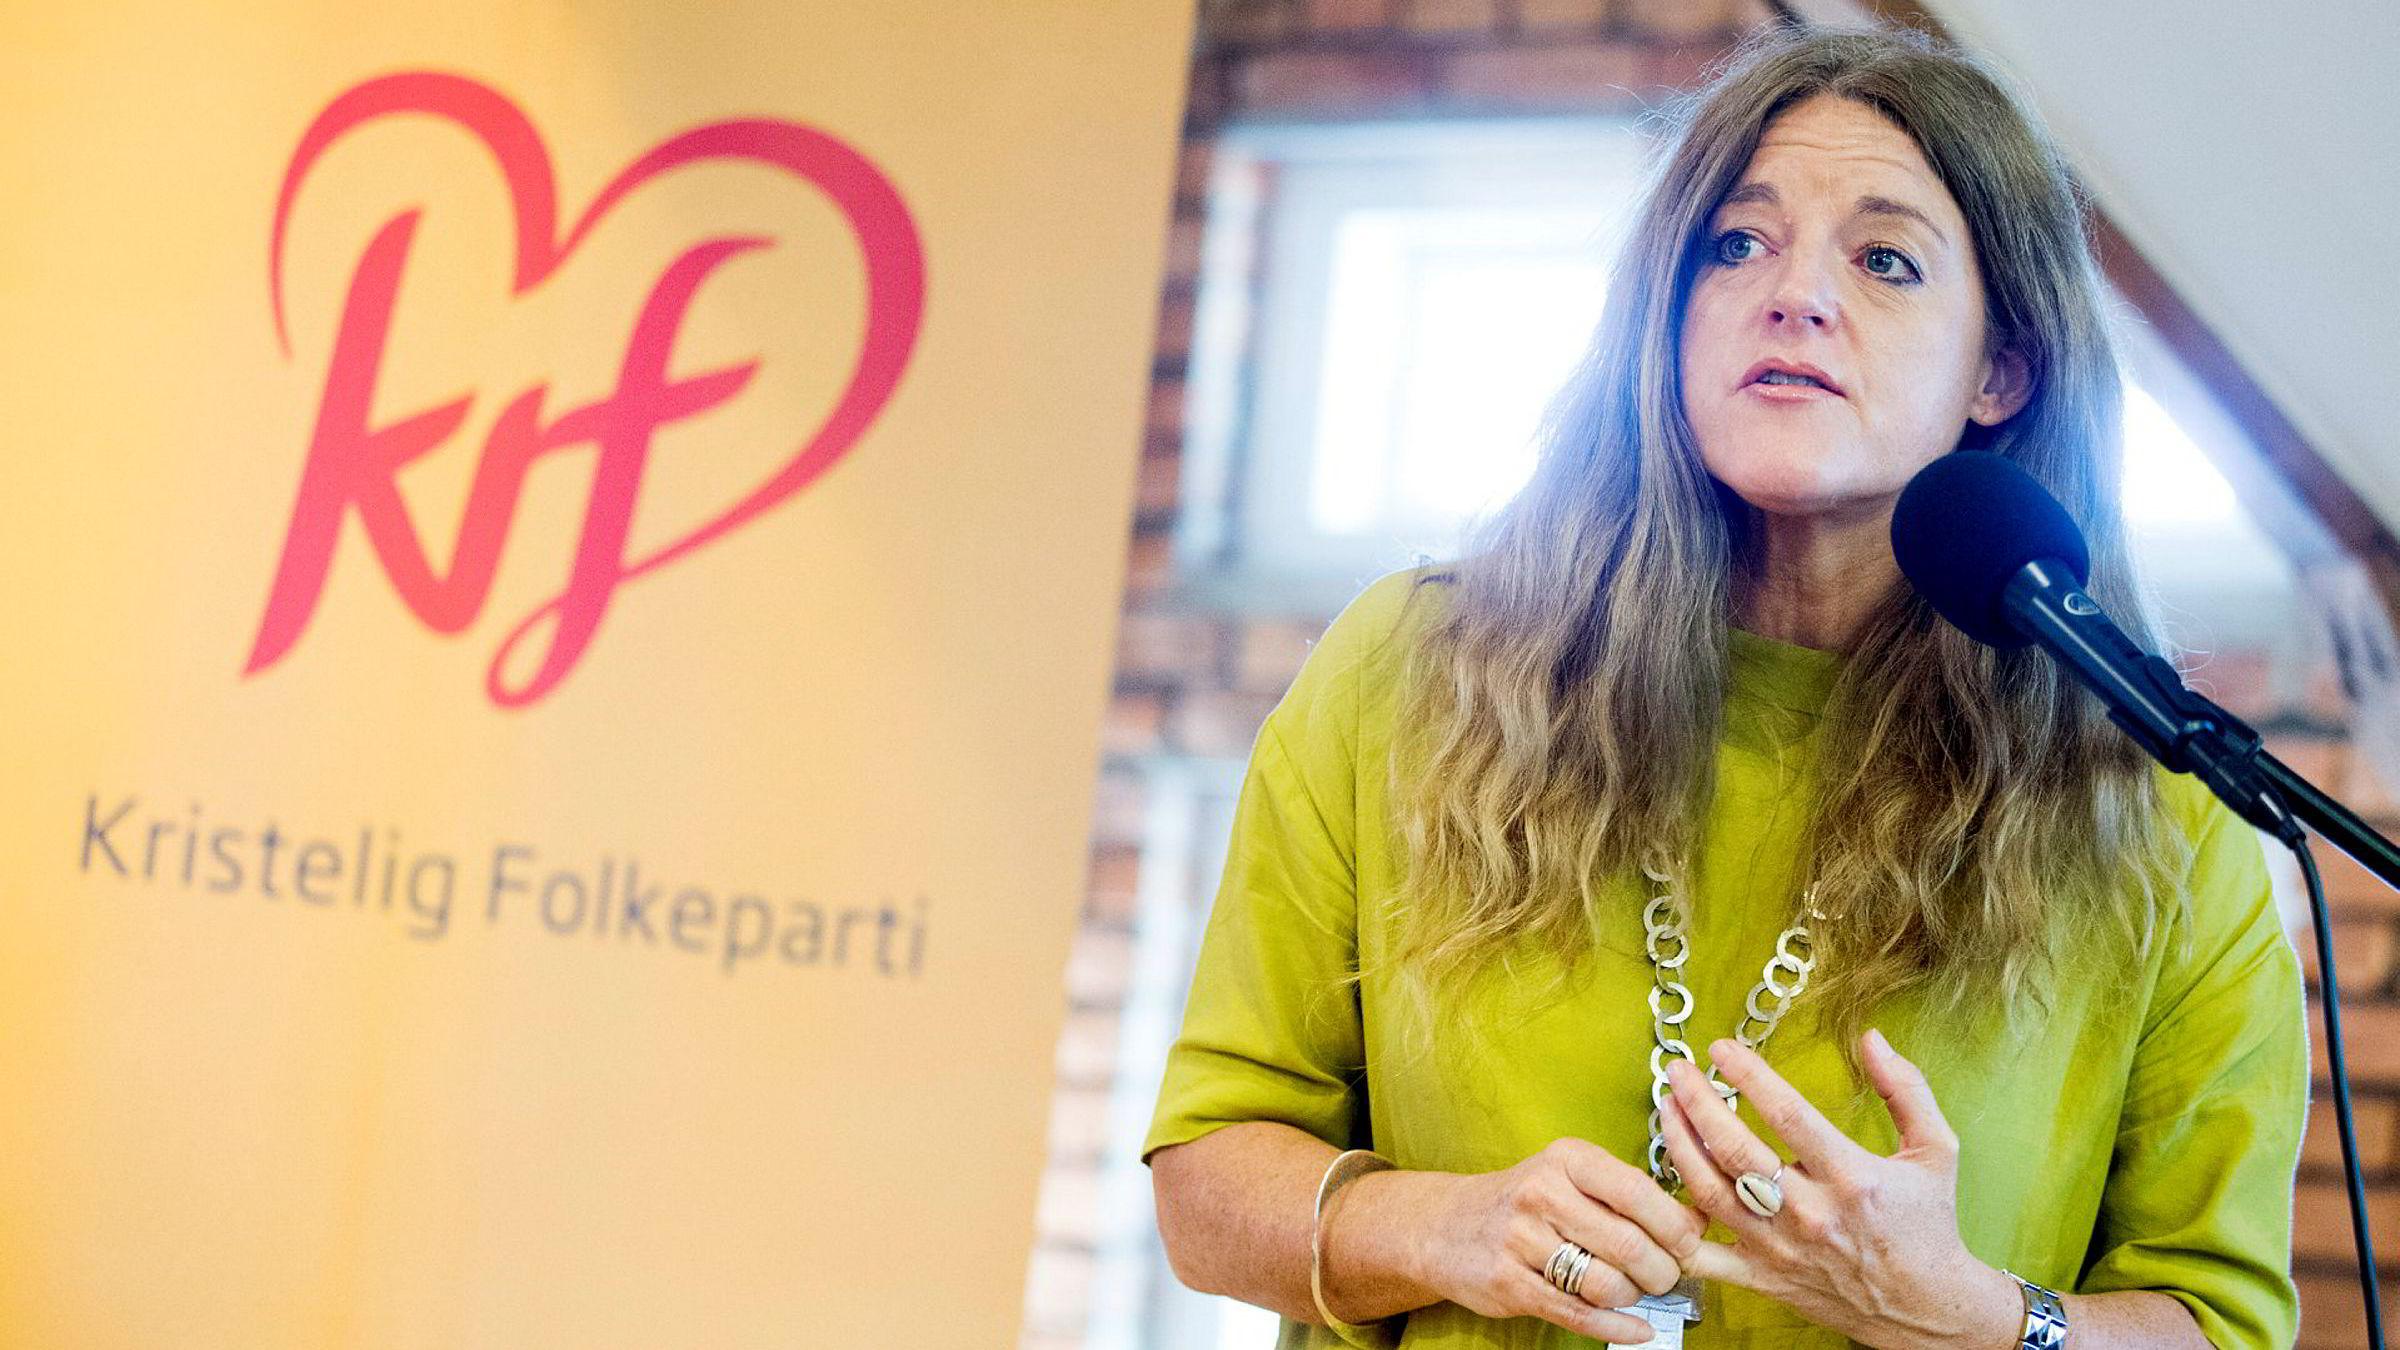 Generalsekretær Hilde Frafjord Johnson sier nedgangen er knyttet til en langvarig trend i partiene med mindre interesse for partimedlemskap.